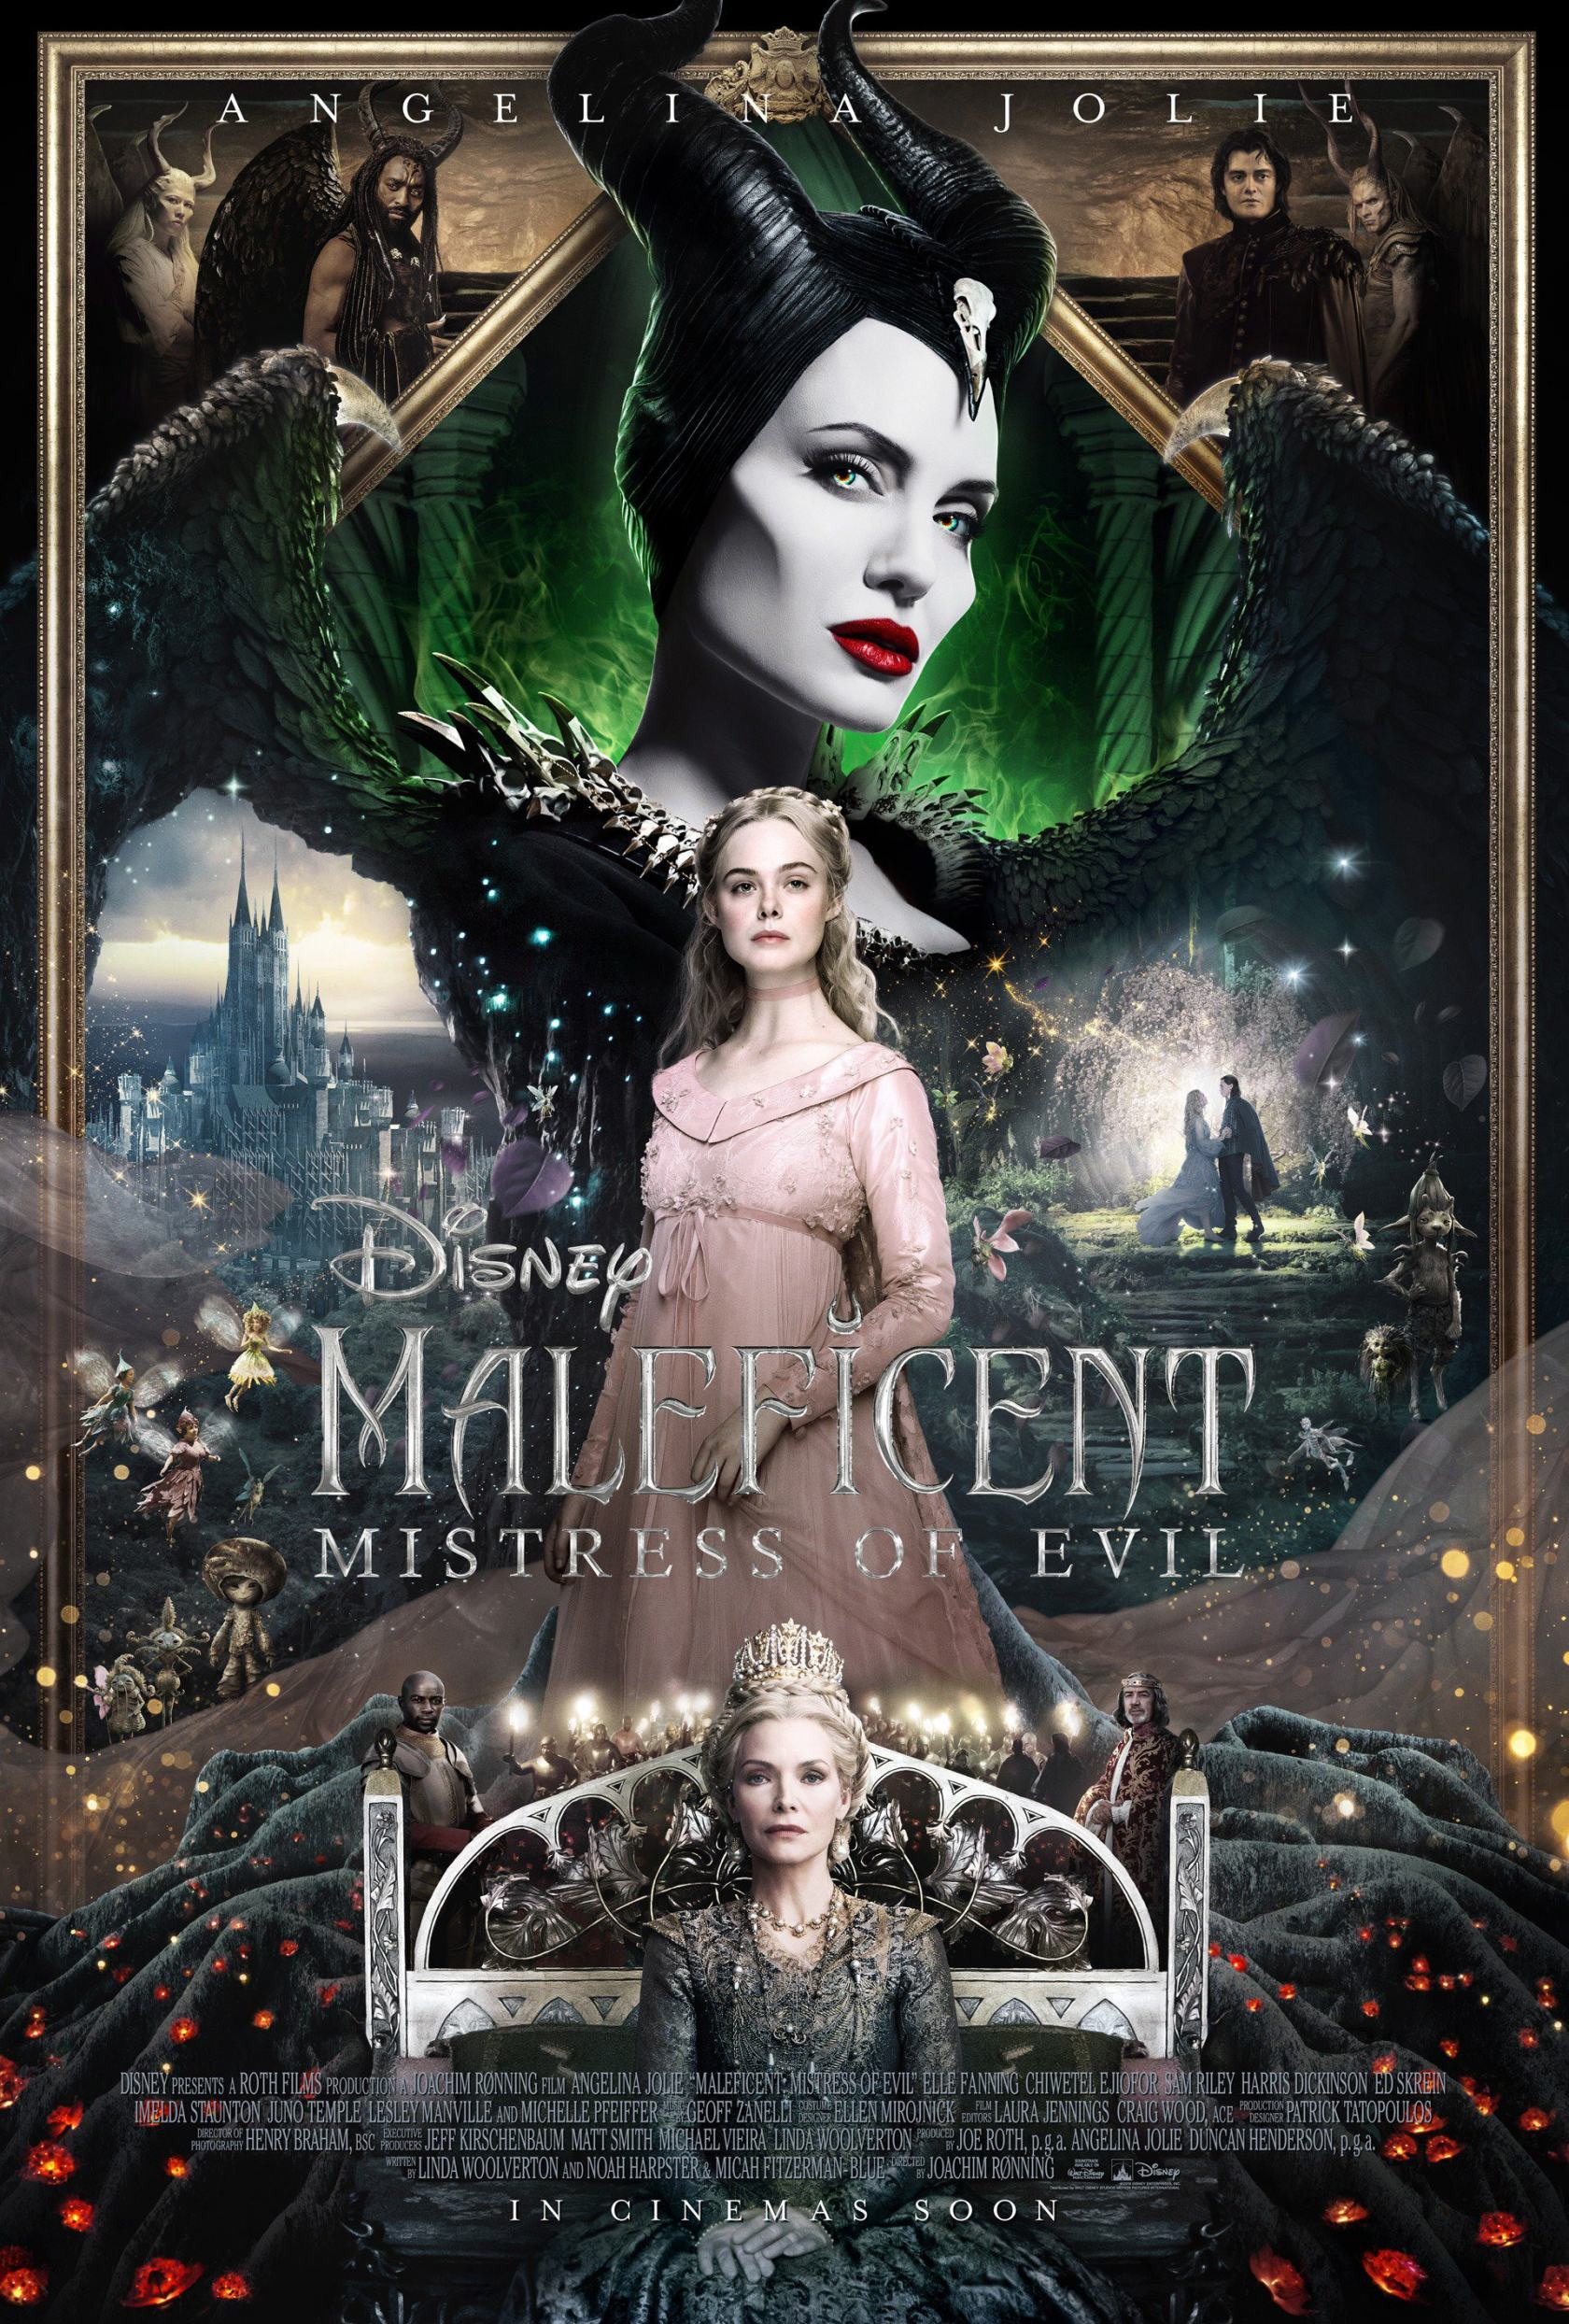 Image result for maleficent mistress of evil poster